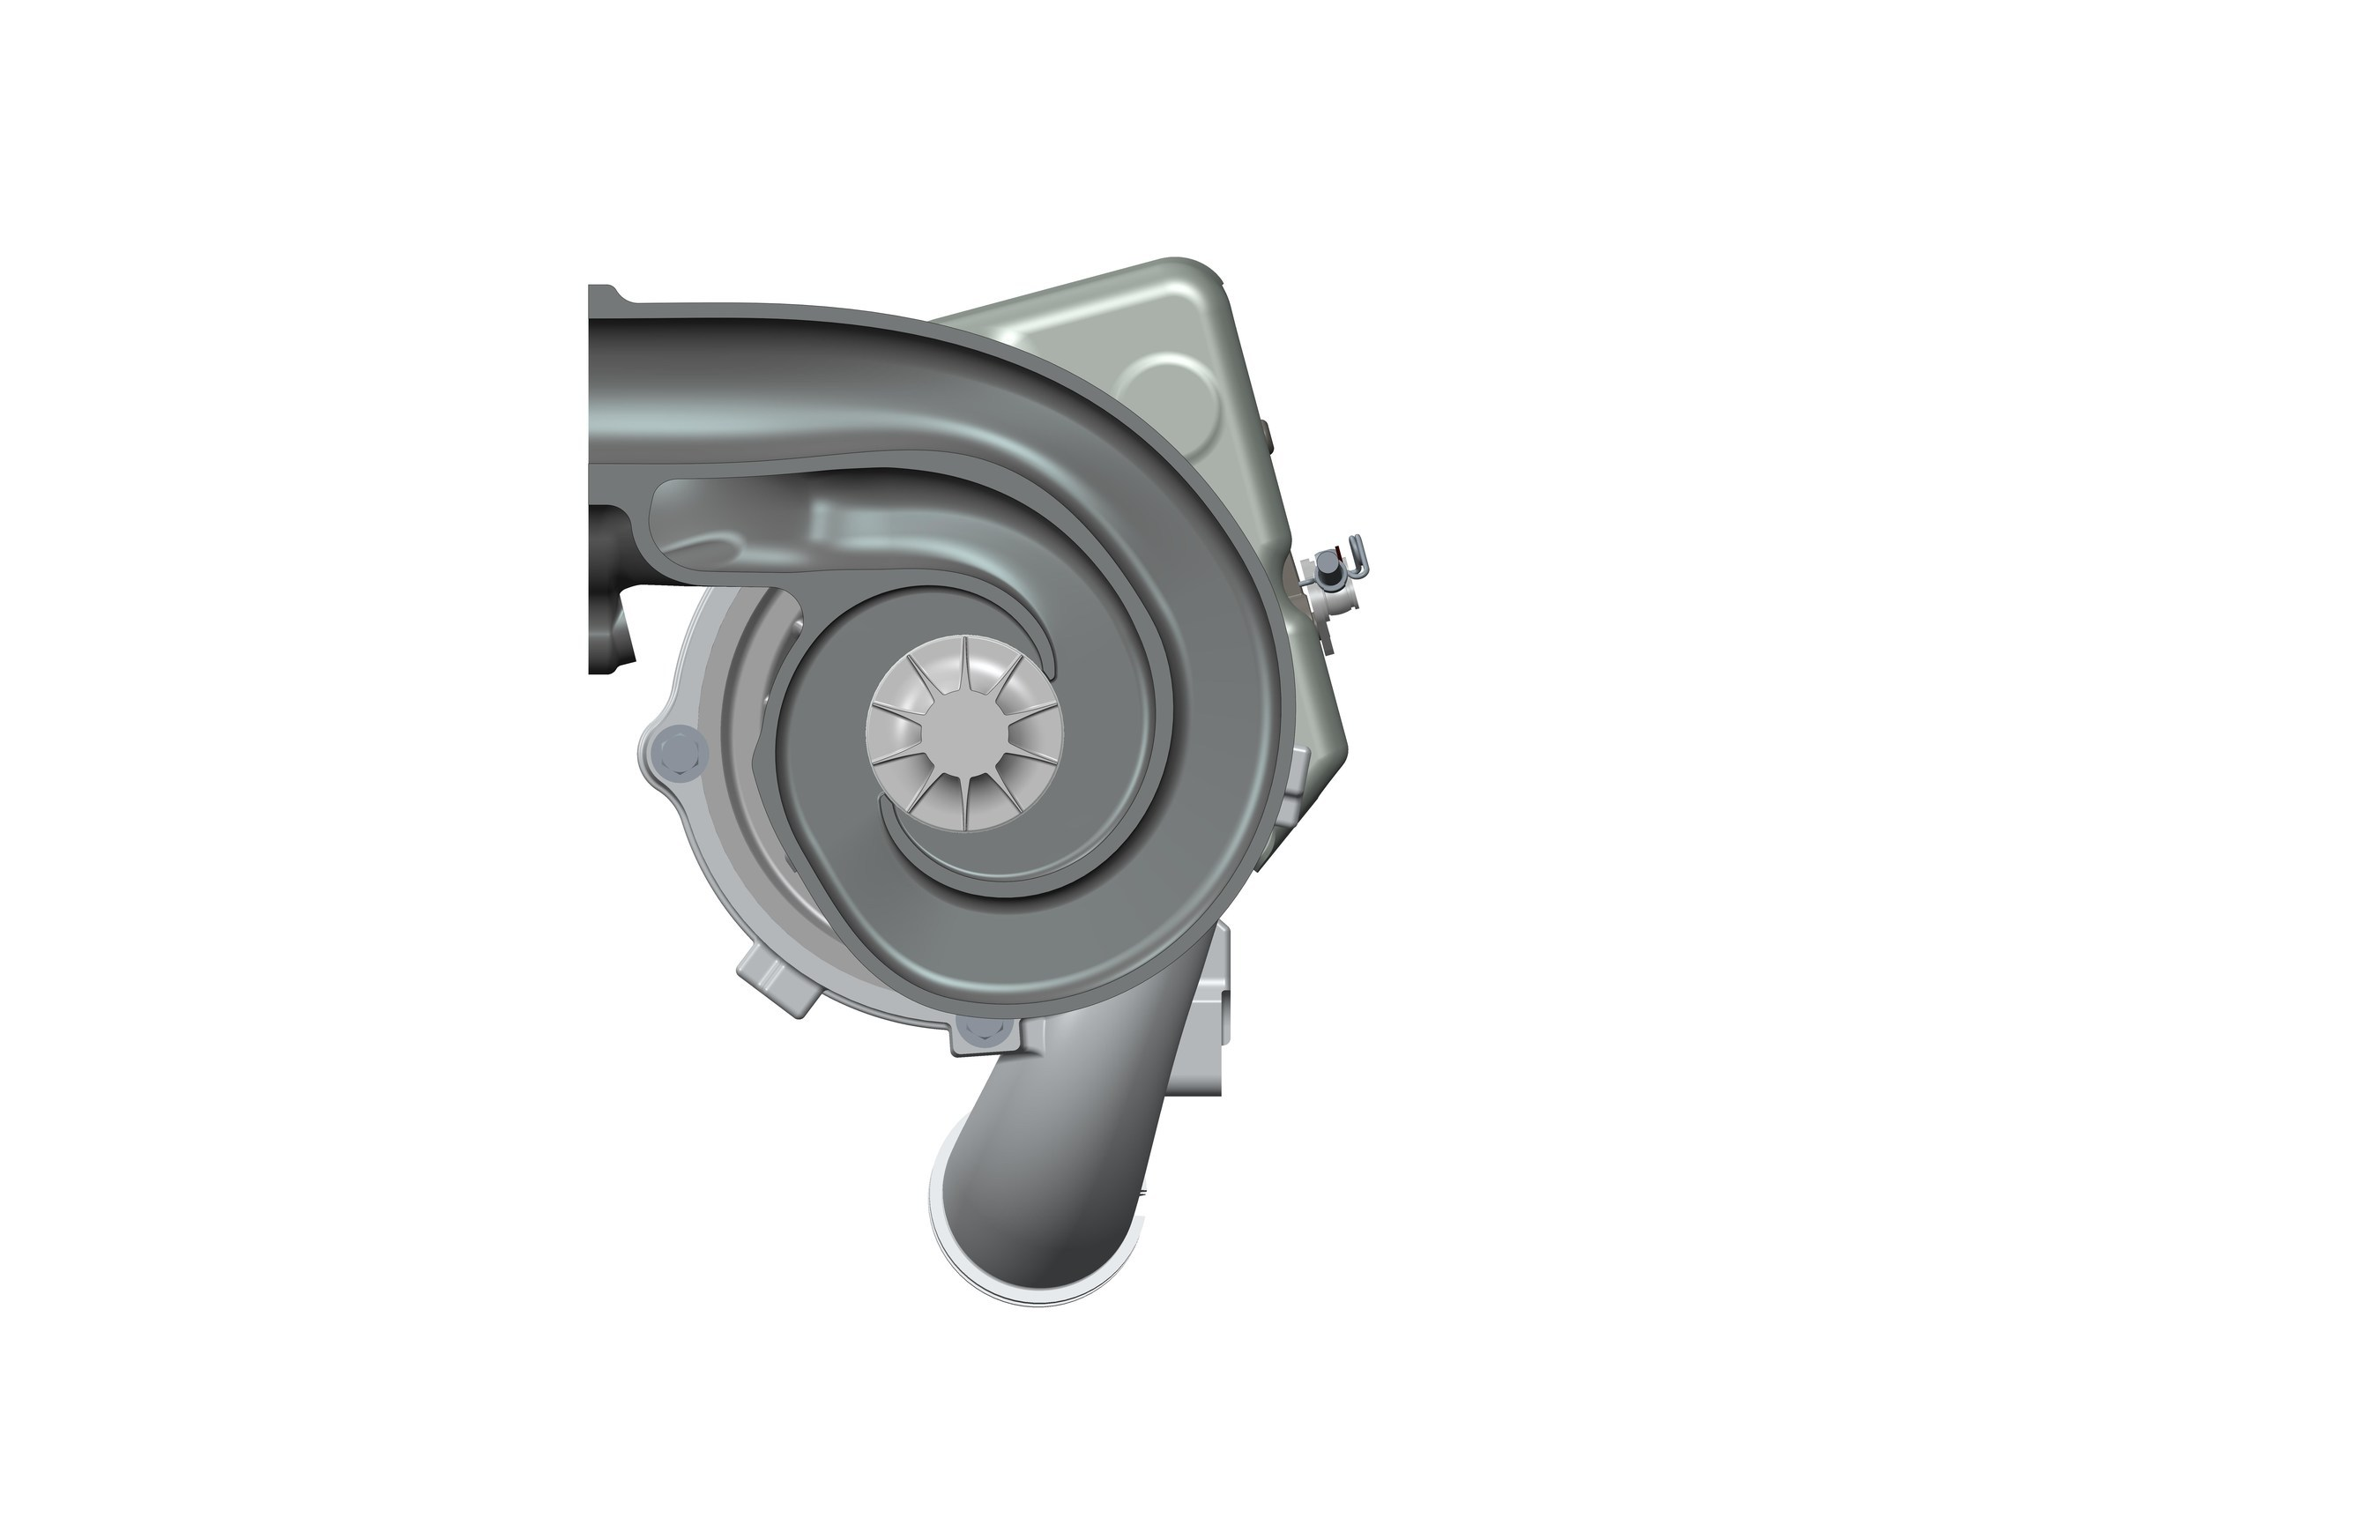 Borg Warner S565 Pressure Switch